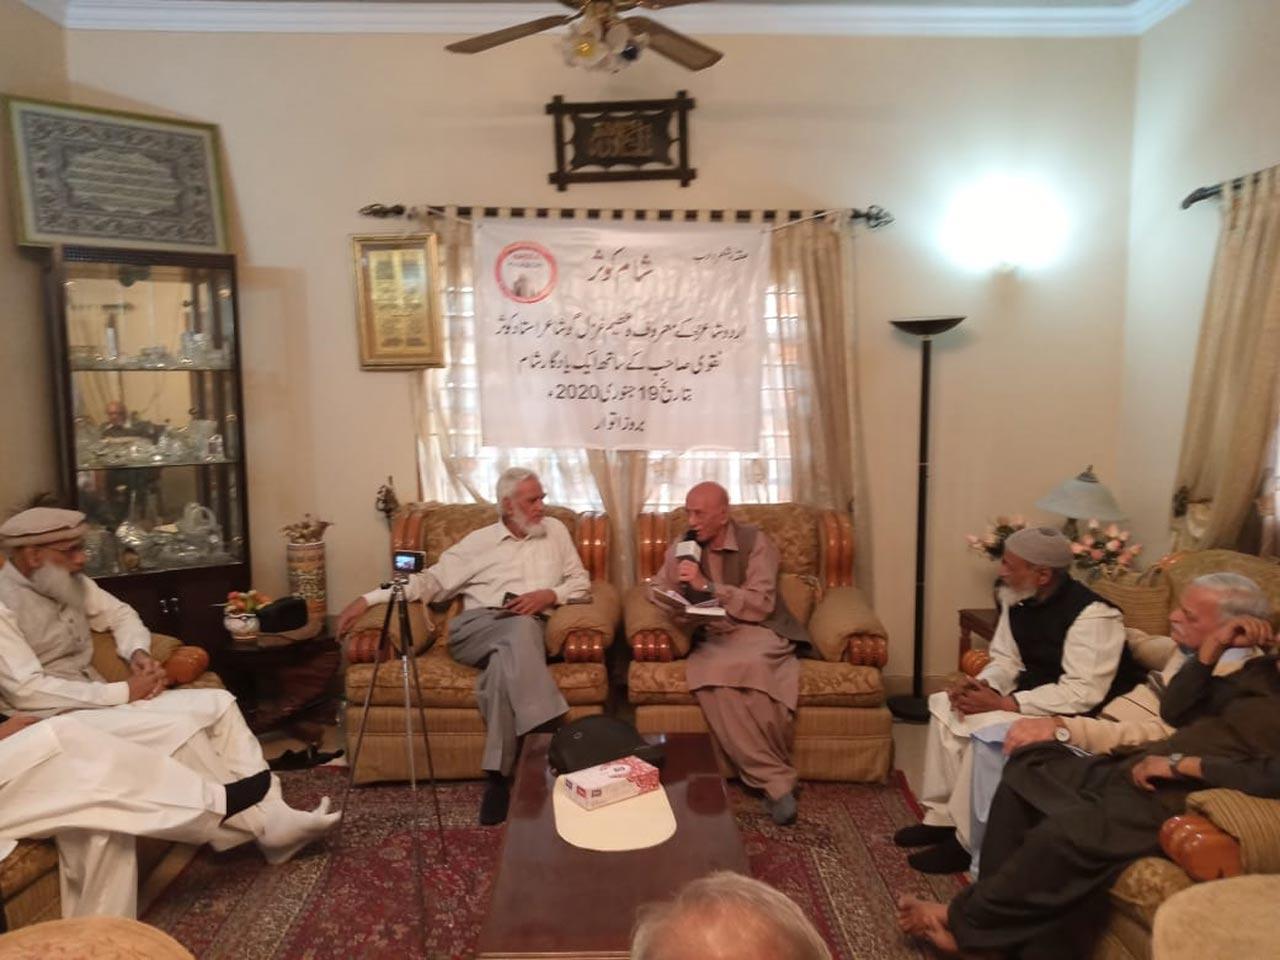 Saleemullah Hussain, Kamal A. Farooqi, Kosar Naqvi, Mohammed Idrees Siddiqui, Waseem Siddiqui, Sabir Ali Khan